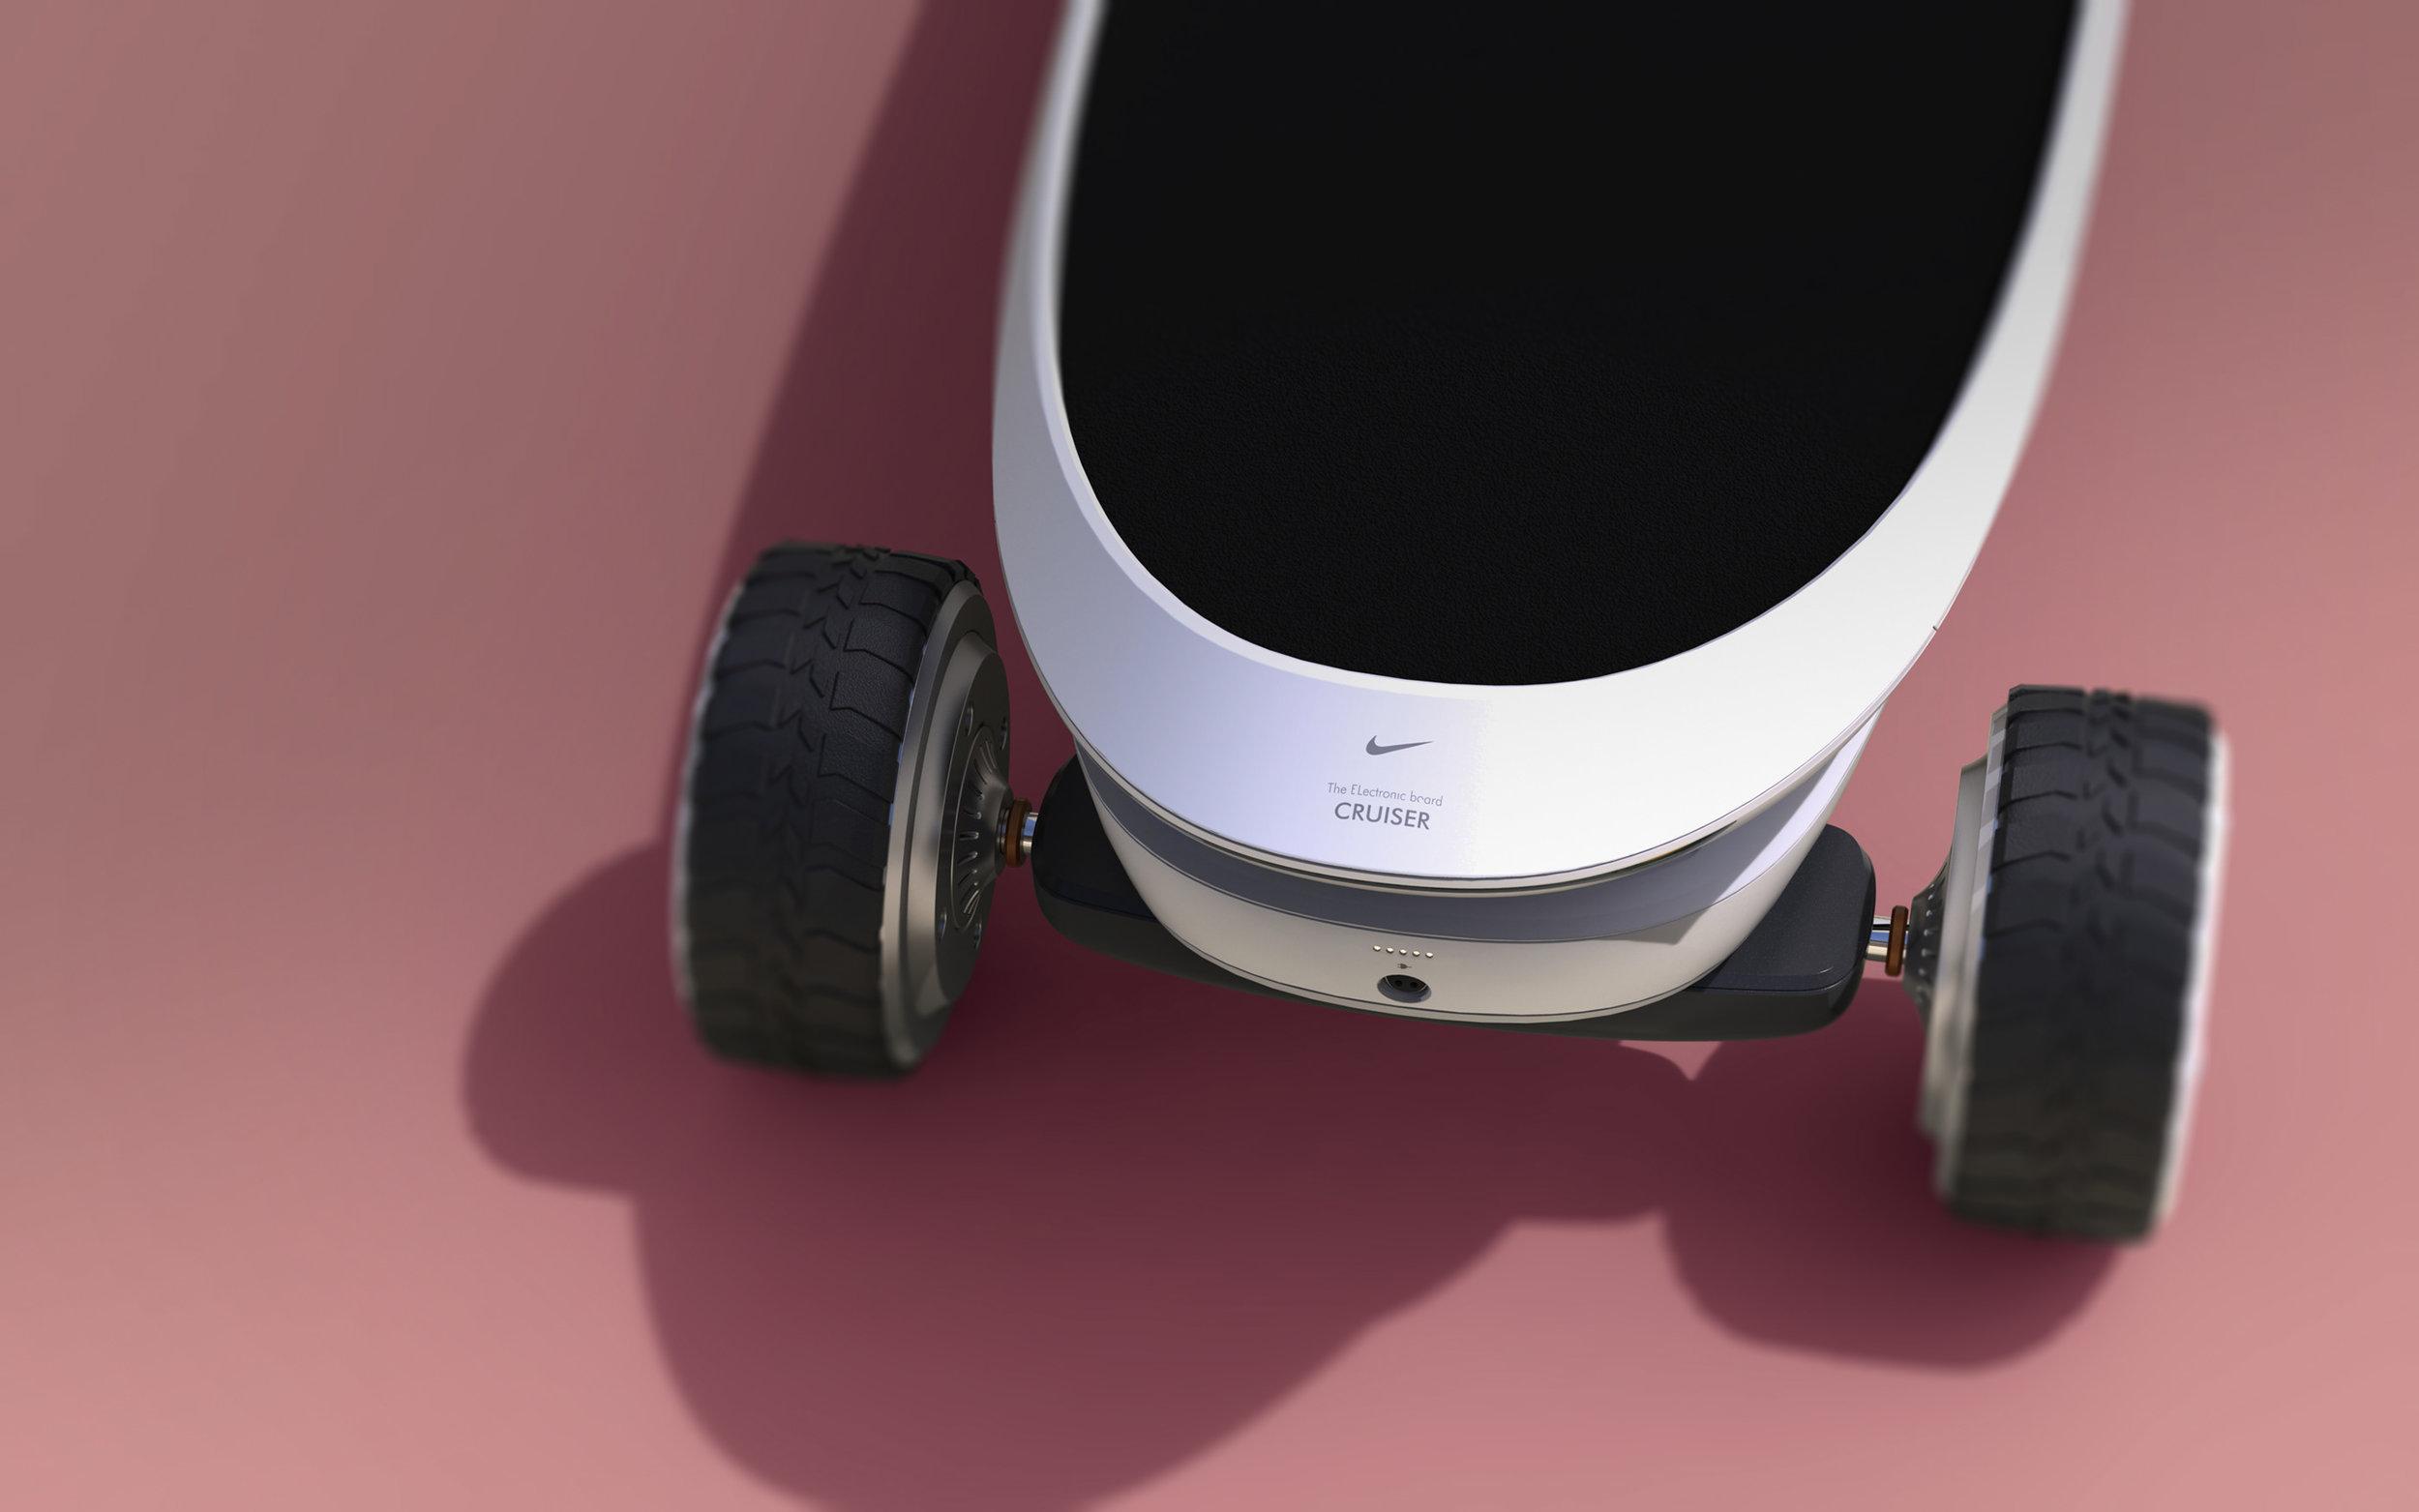 electric-scooter-jaehyuk-lim-03.jpg